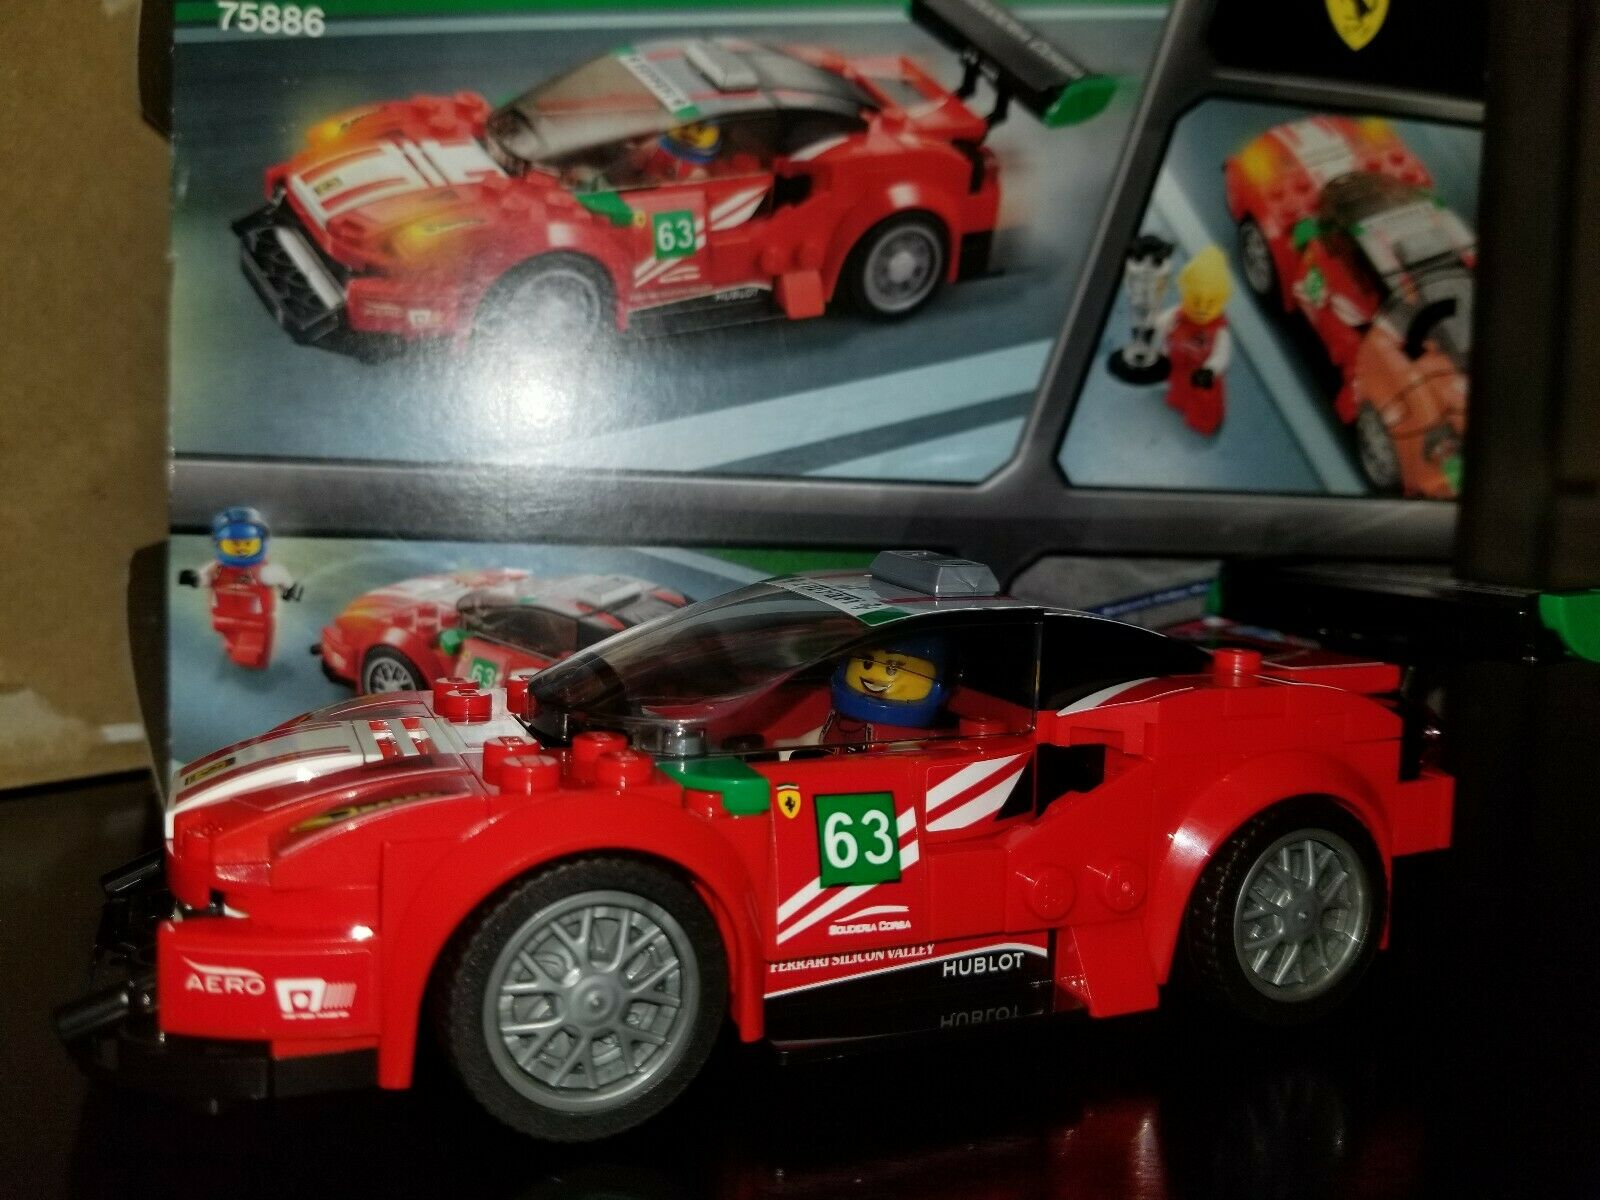 LEGO Speed Champions Champions Champions Assembled Ferrari 488 GT3 Scuderia Corsa 75886 Race Car d6e940